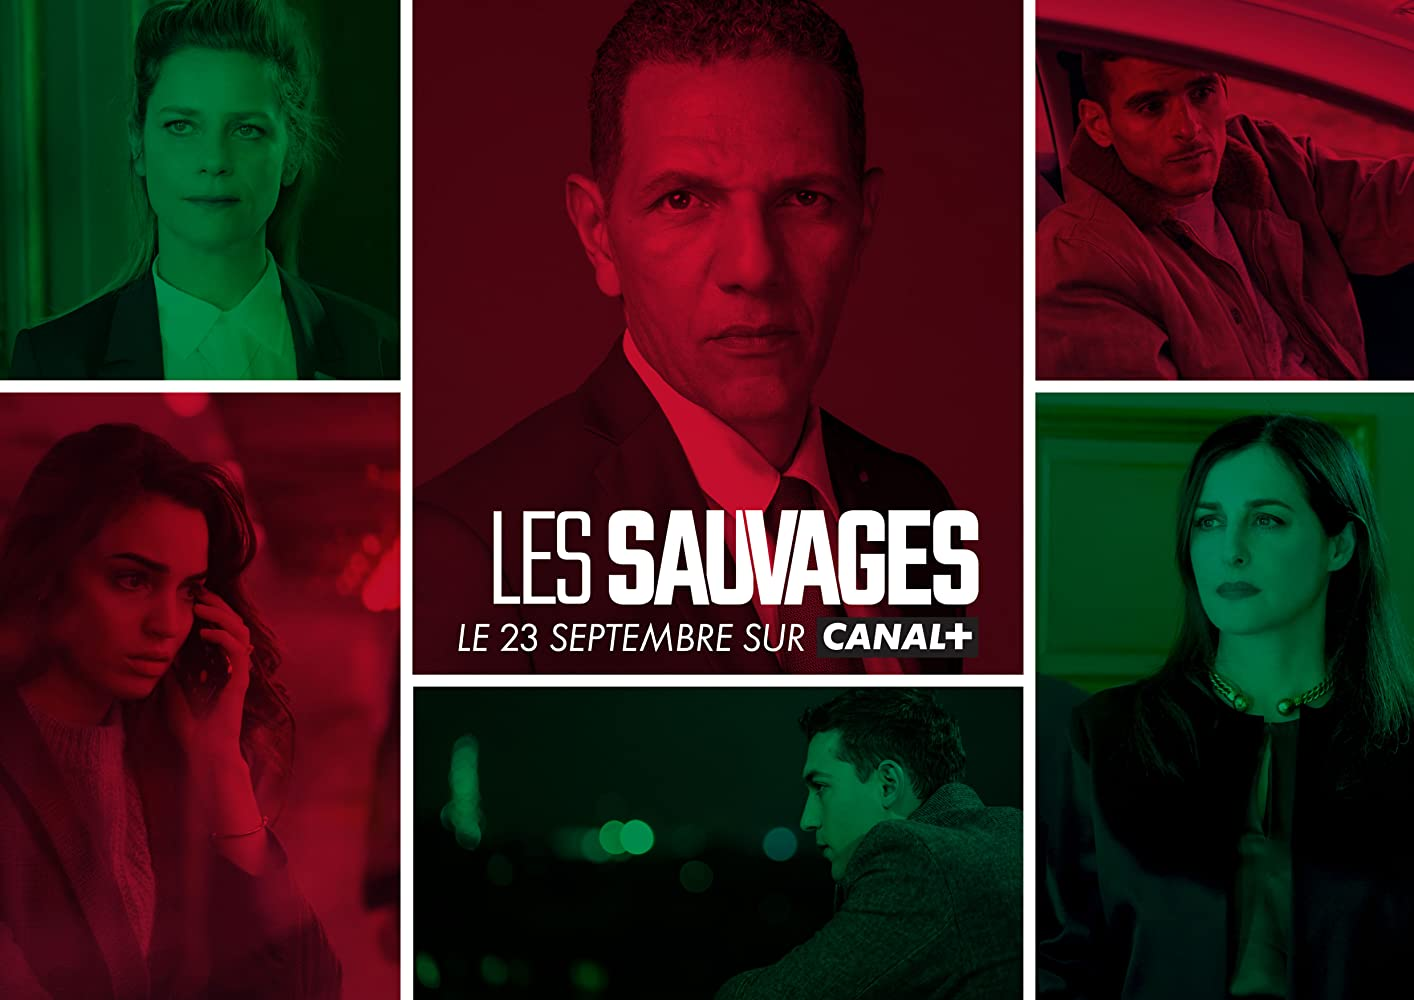 Amira Casar, Marina Foïs, Roschdy Zem, Sofiane Zermani, Dali Benssalah, and Souheila Yacoub in Les sauvages (2019)